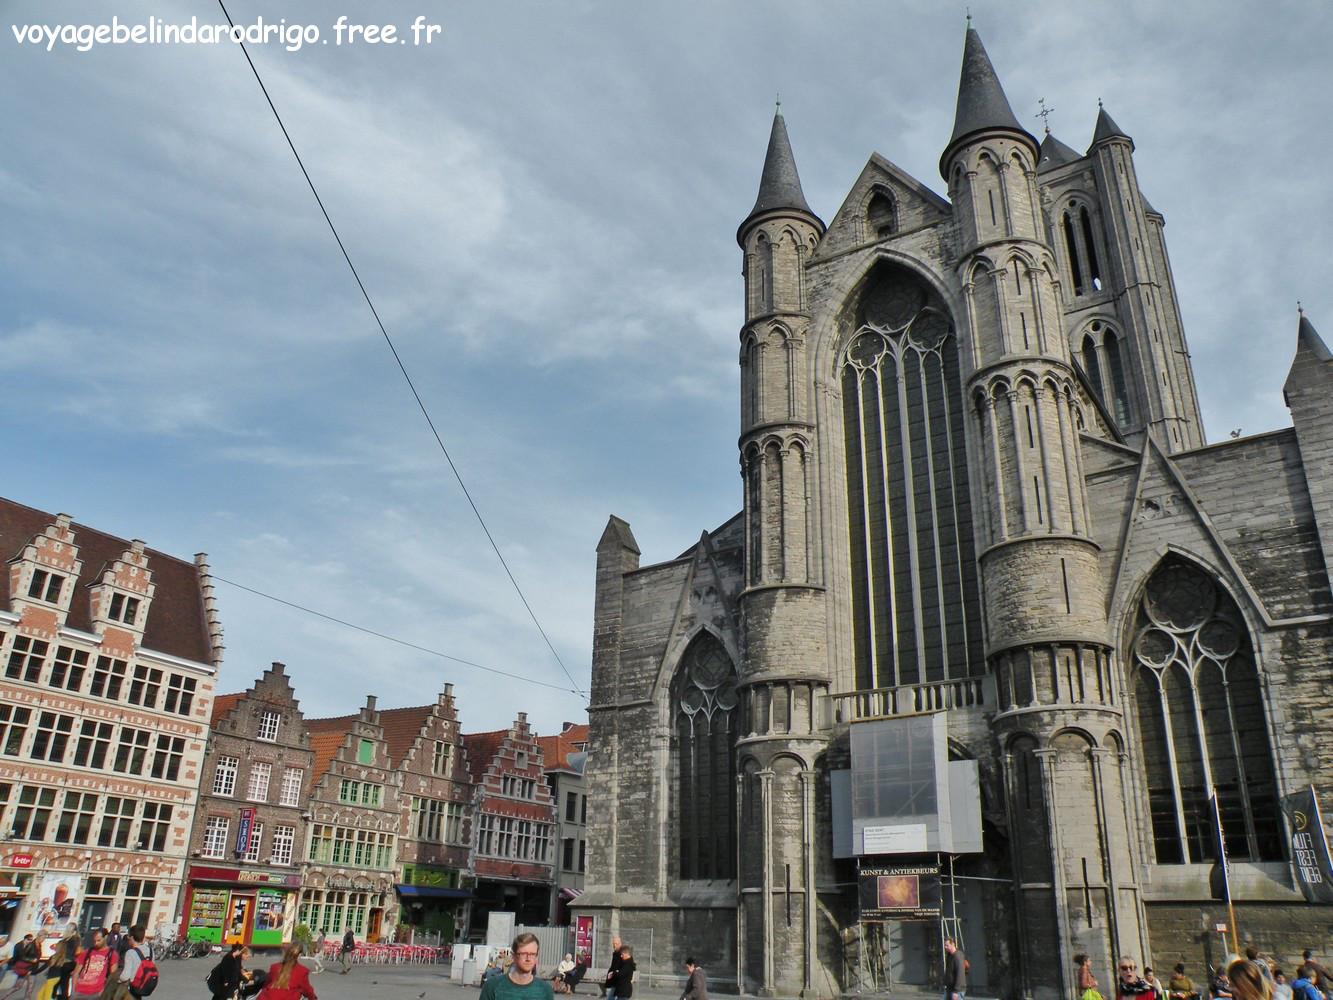 Eglise Saint Nicolas et place Korenmarkt - Gand